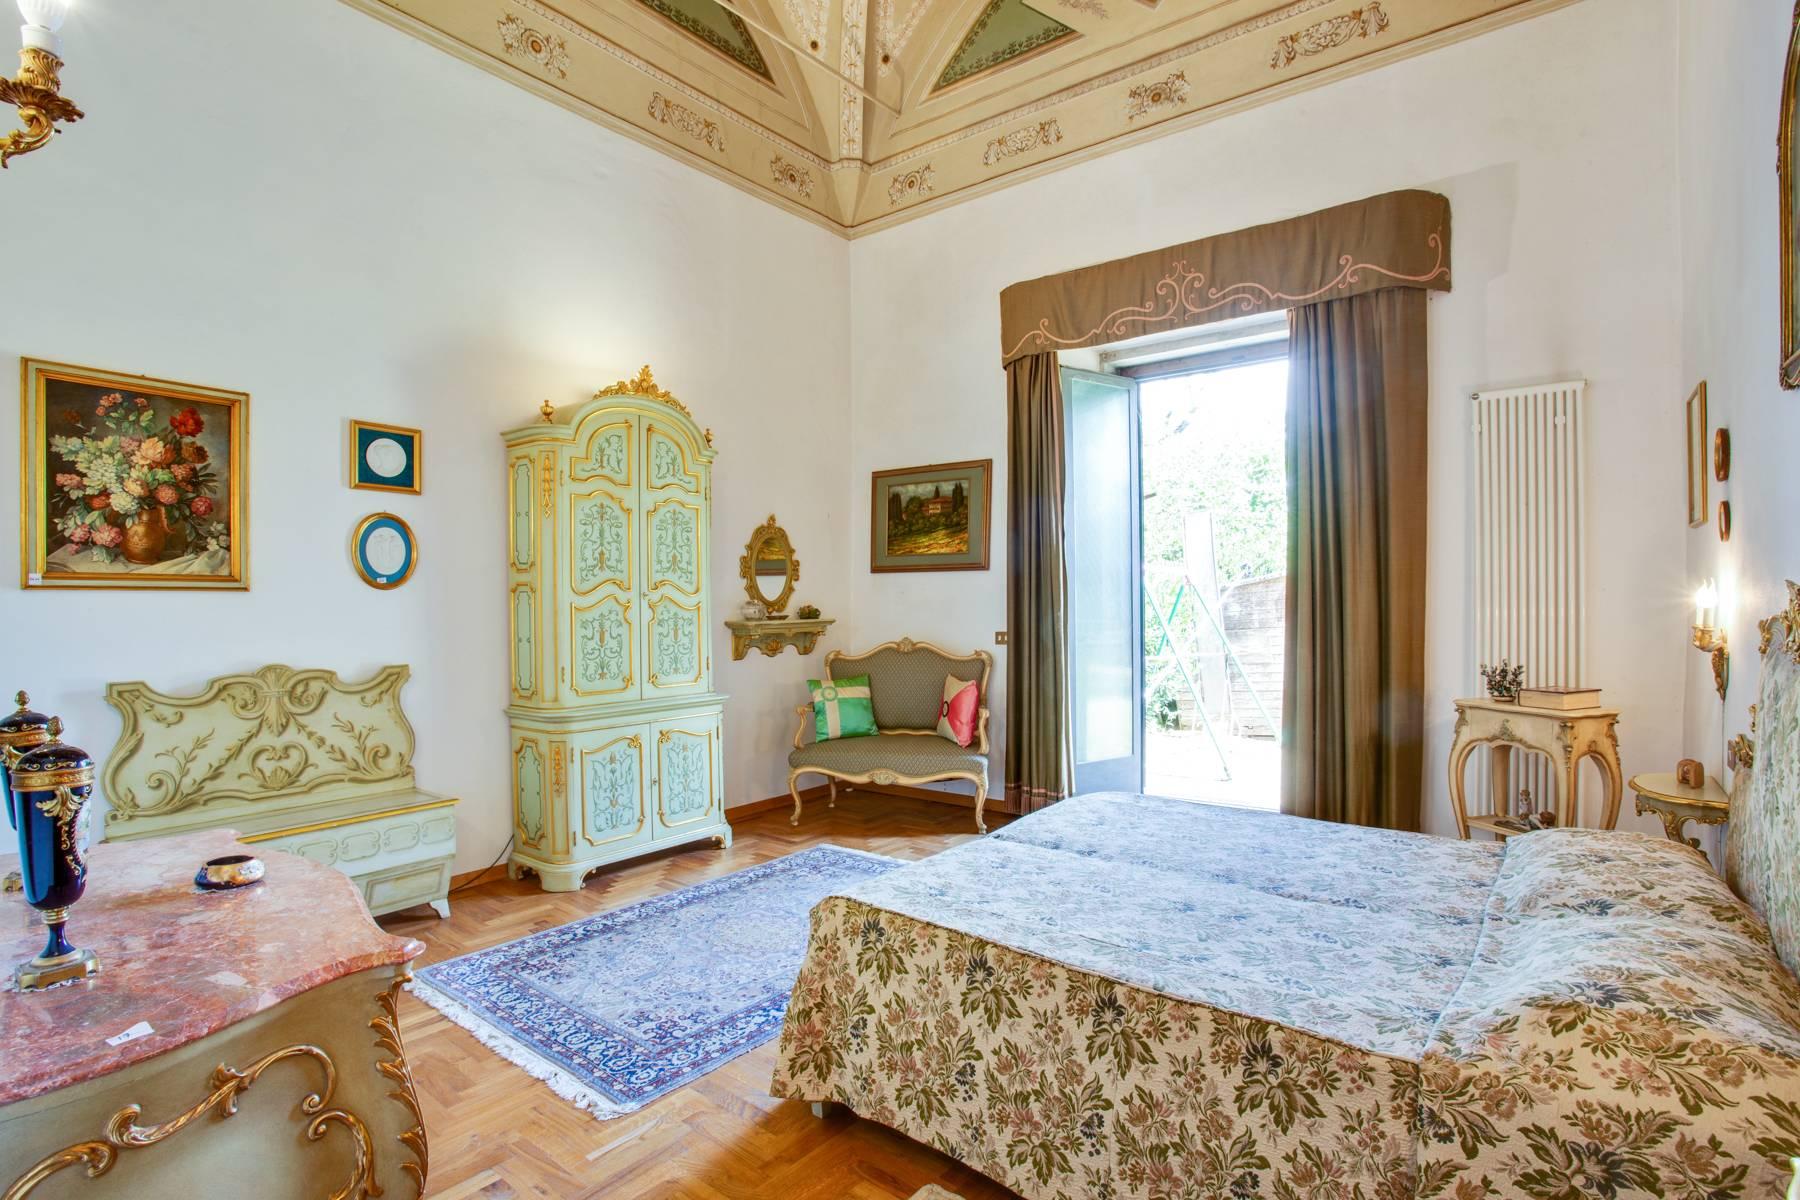 Appartamento in Vendita a Scandicci: 5 locali, 140 mq - Foto 7